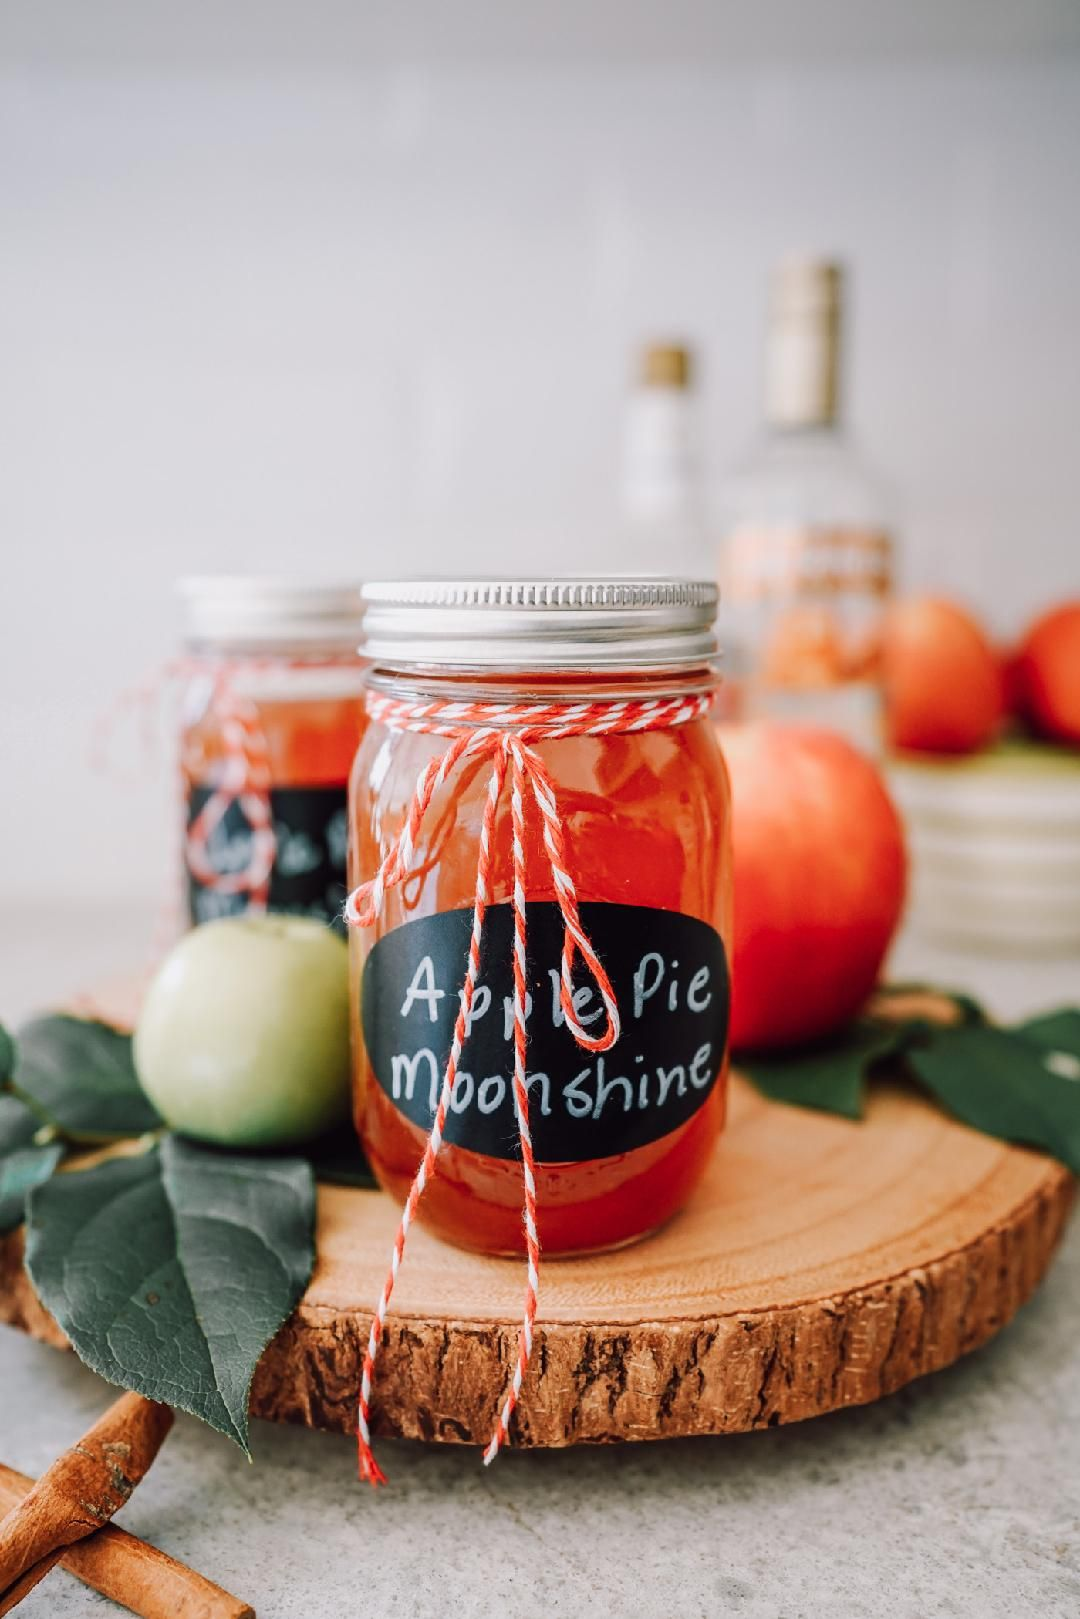 Ninja Foodi Mostaccioli The Tasty Travelers Moonshine Recipes Apple Pie Moonshine Instant Pot Recipes